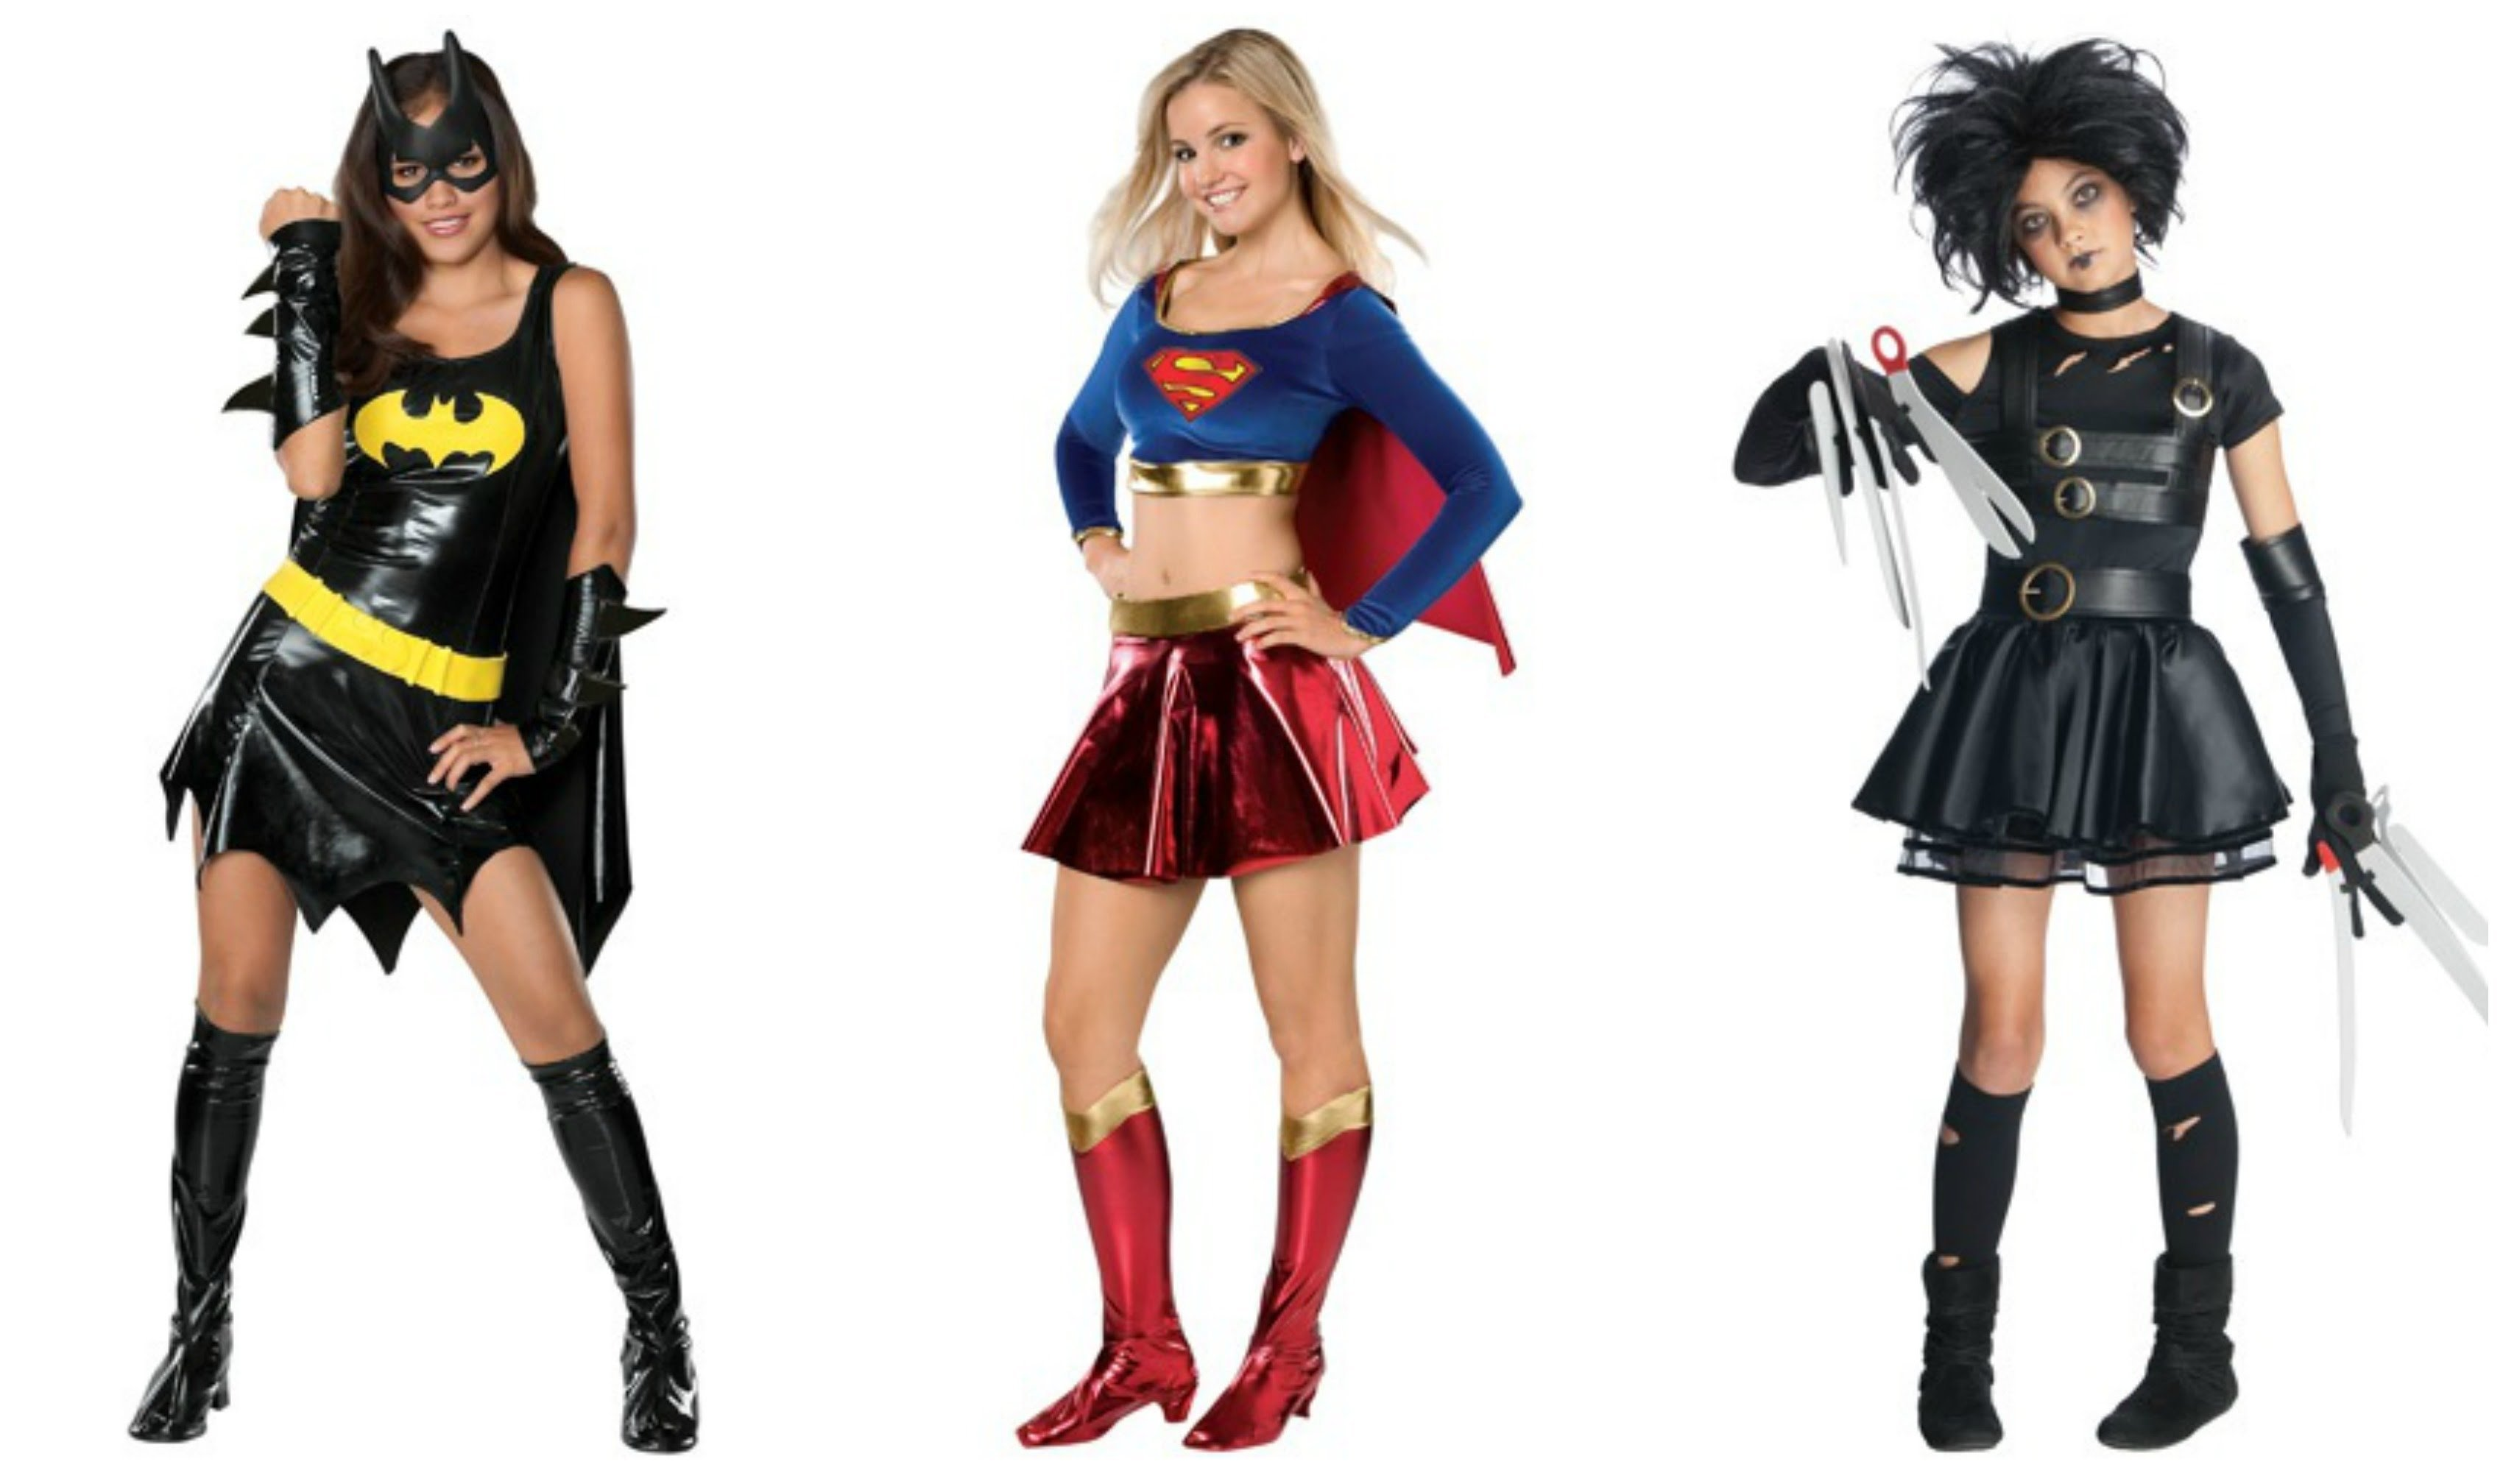 10 Great Teenage Girl Costume Ideas Halloween halloween costume ideas for teens girls youtube halloween costumes 10 2021